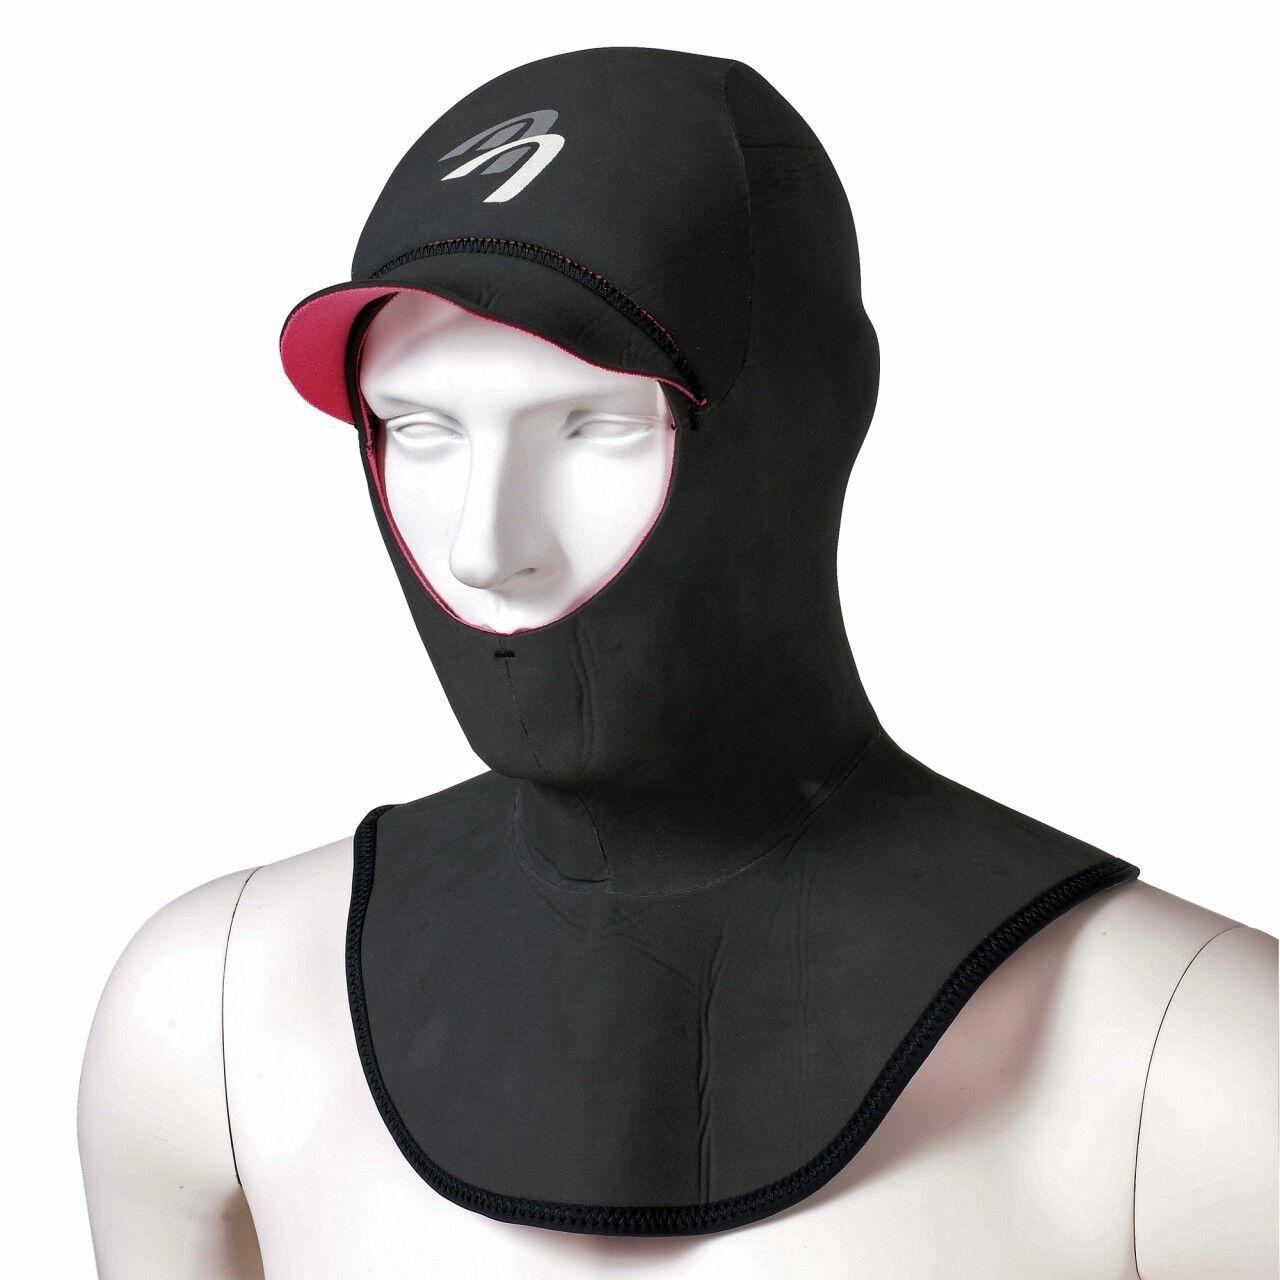 ASCAN Neopren-Haube Hood Comfort - idealer Kälteschutz für Kopf beim Surfen